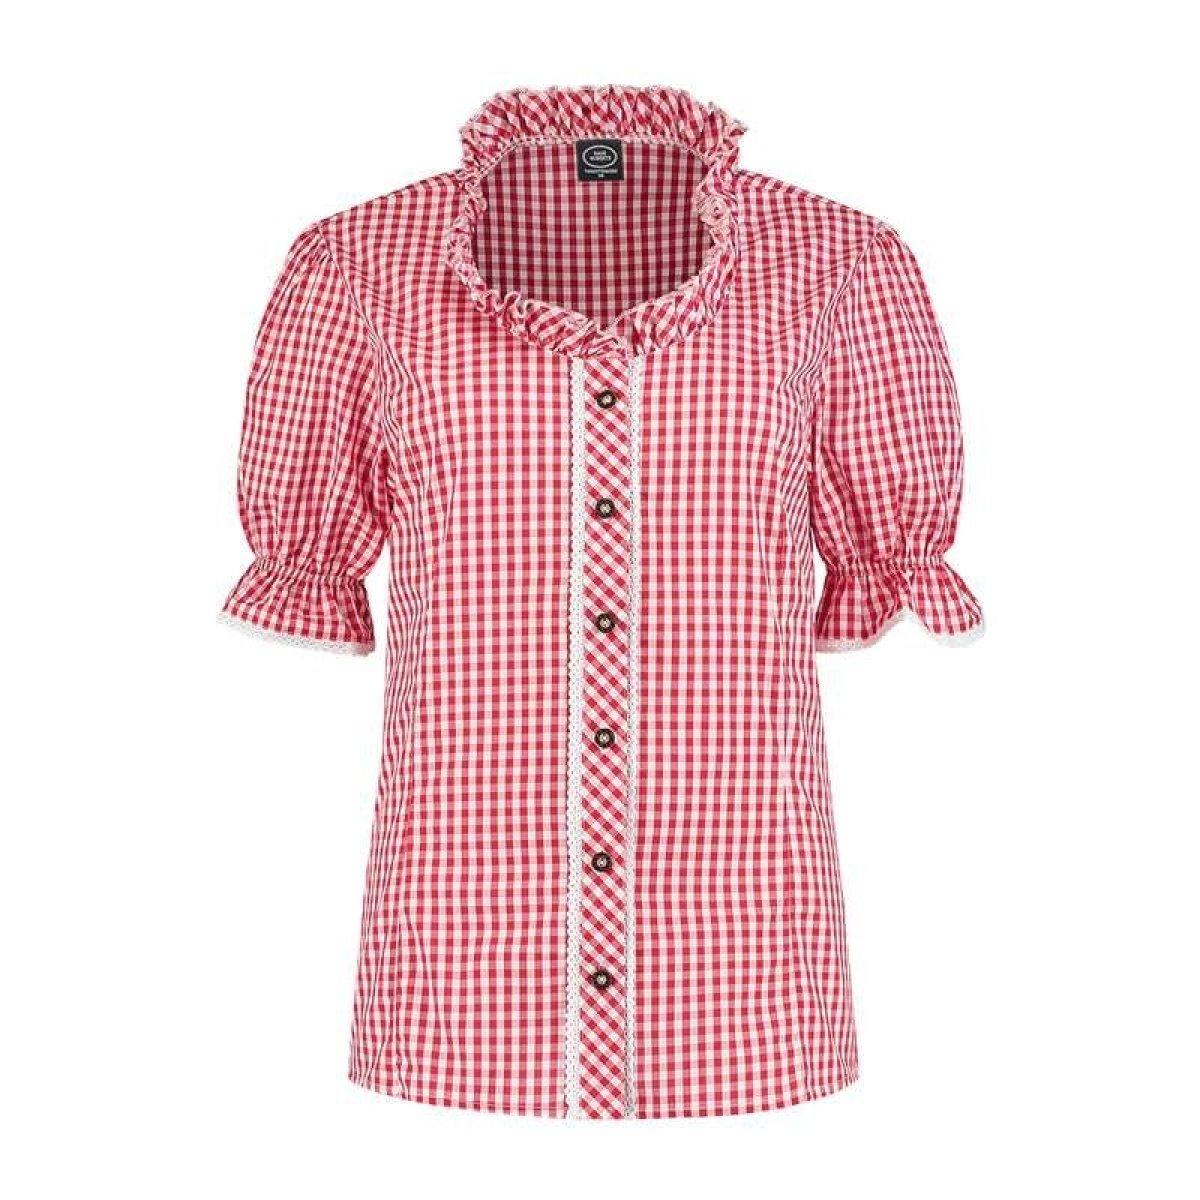 Kjøp Tyrolerskjorte RødHvit Online Nå kun 309 Temashop.no